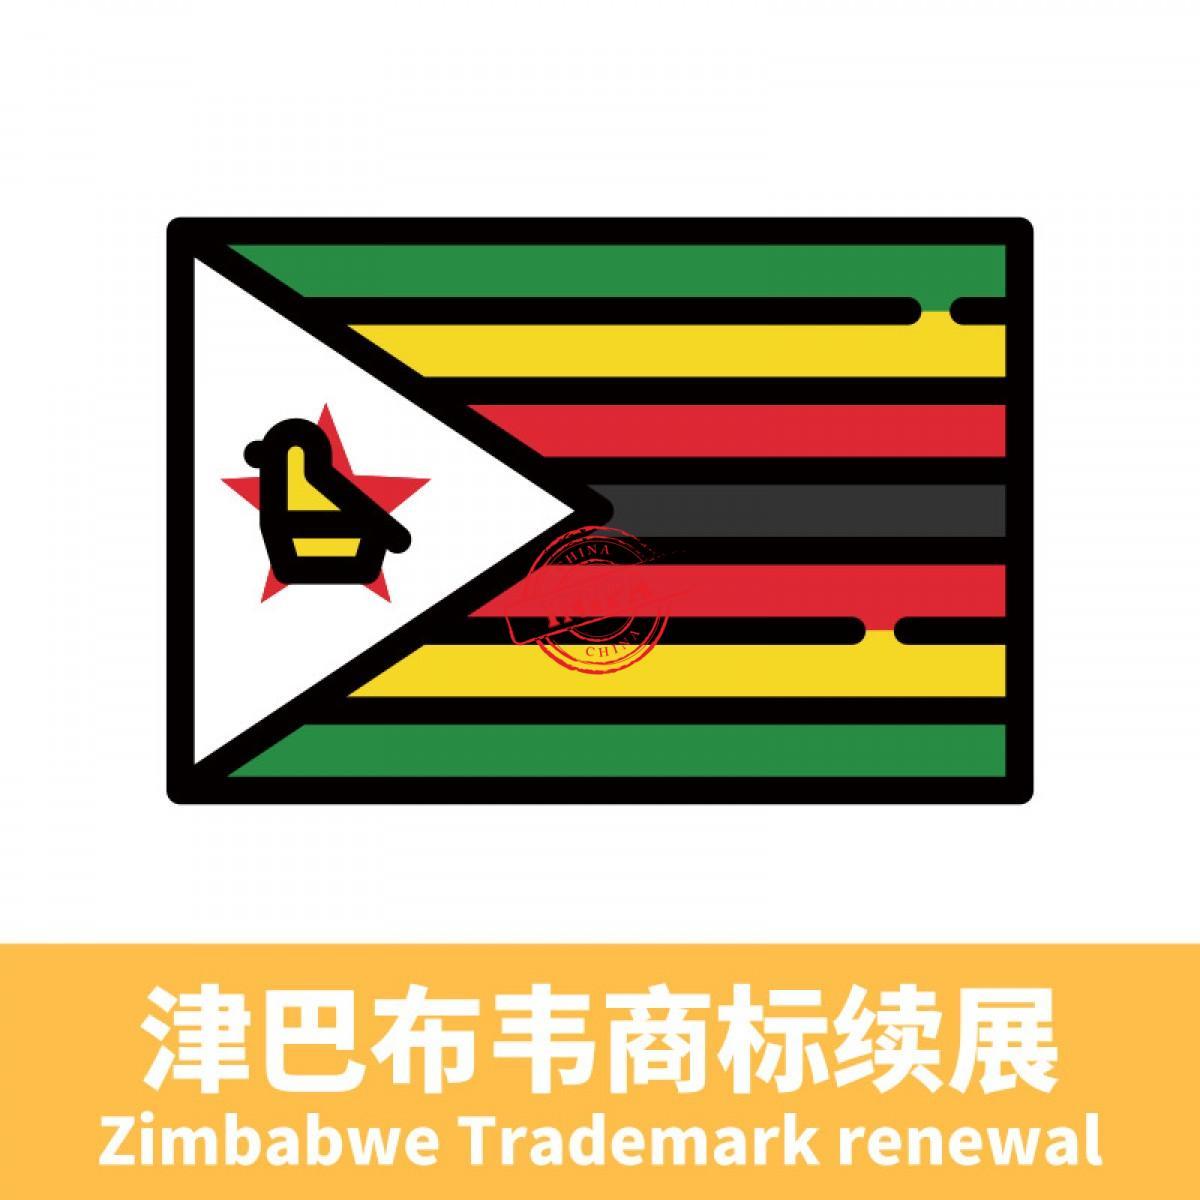 津巴布韦商标续展/Zimbabwe trademark renewal